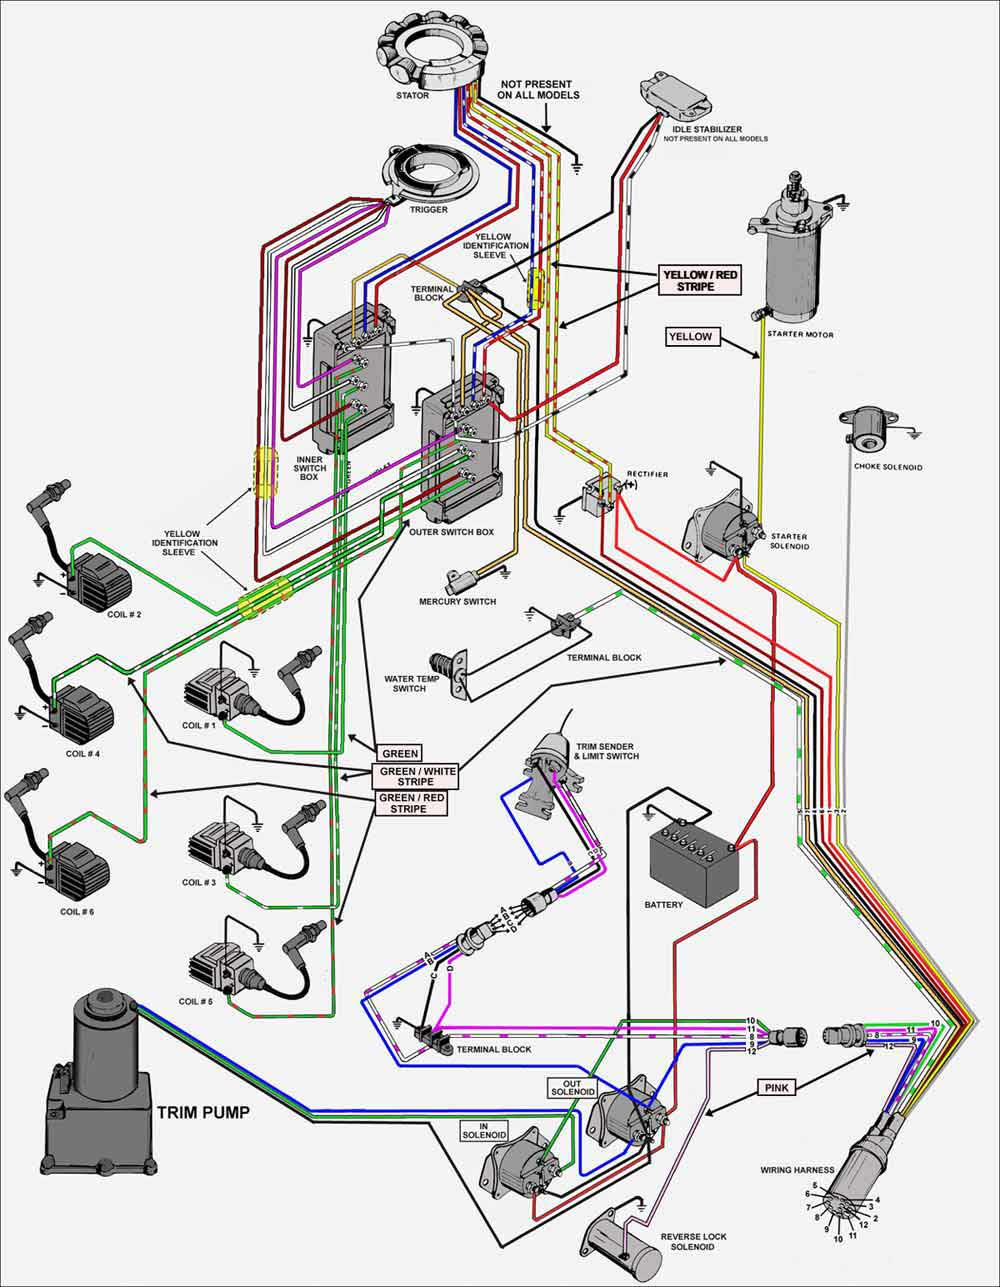 Diagram Yamaha 200 Outboard Wiring Diagram Full Version Hd Quality Wiring Diagram Neckdiagram Gtve It